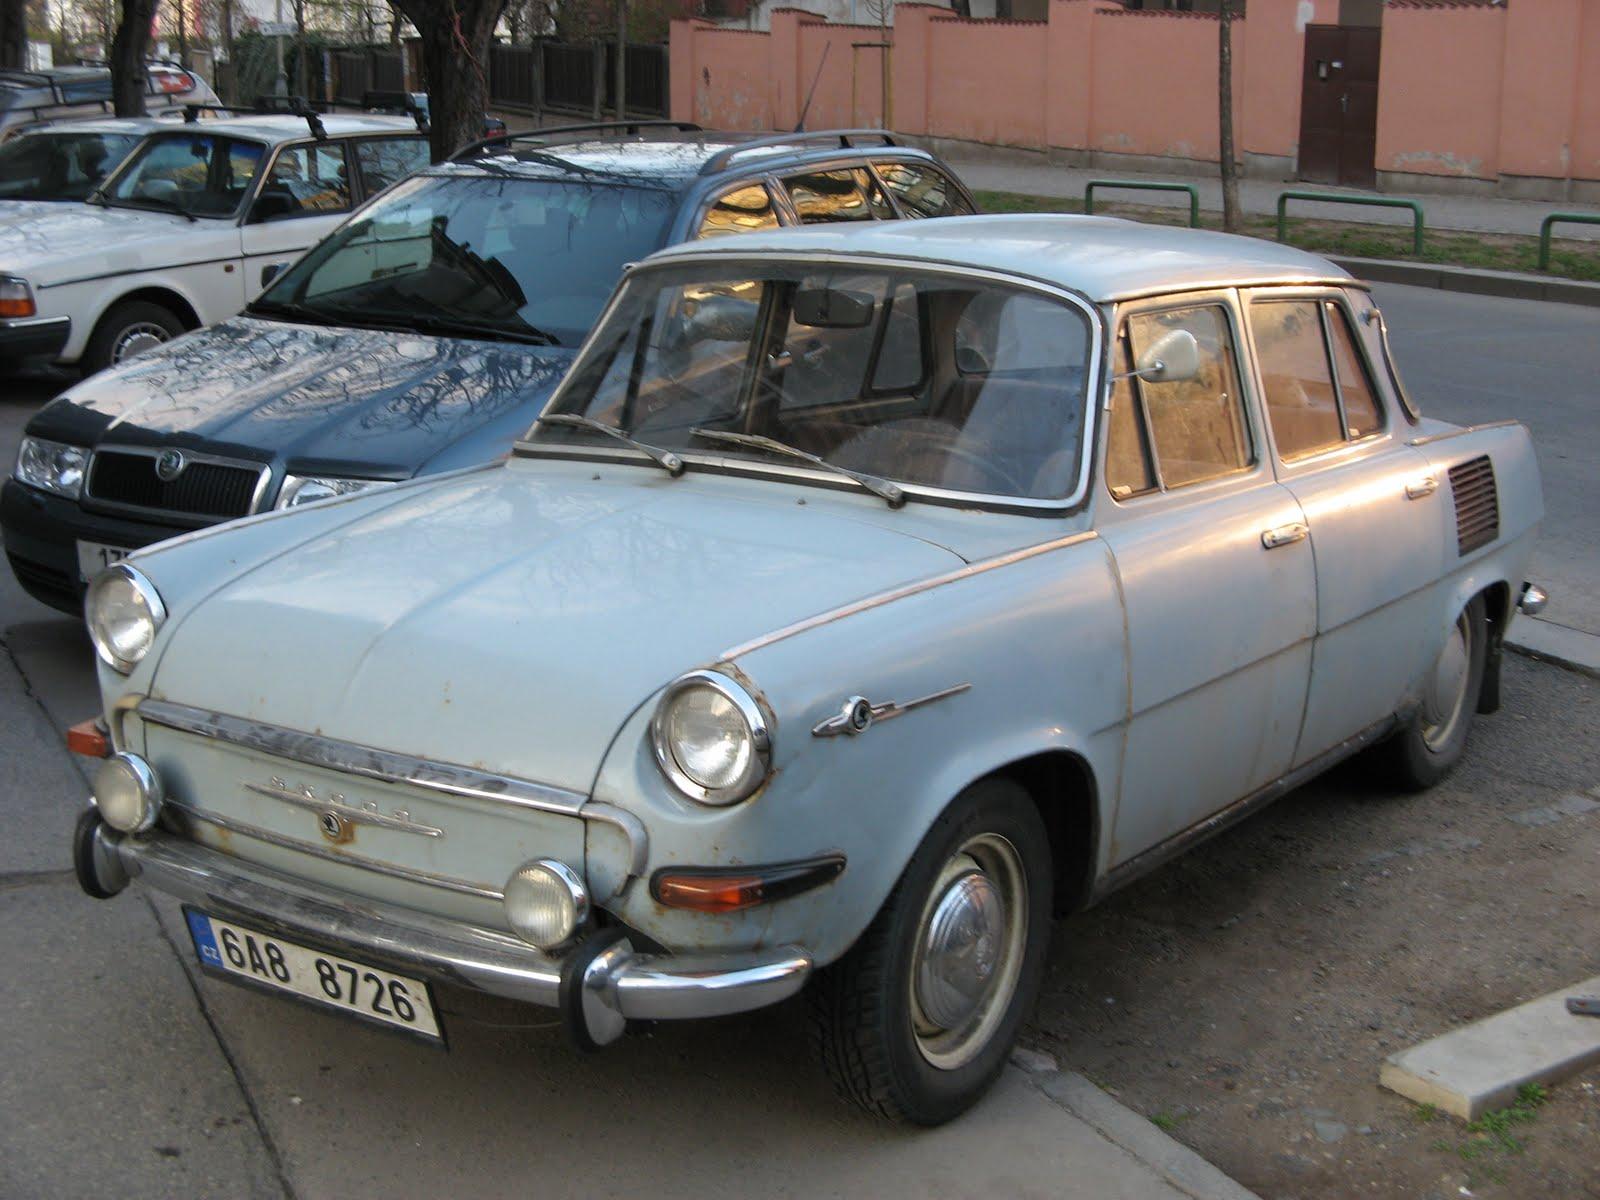 Auto Sale Czech Republic: Off The Beaten Path In The Czech Republic And Slovakia: A